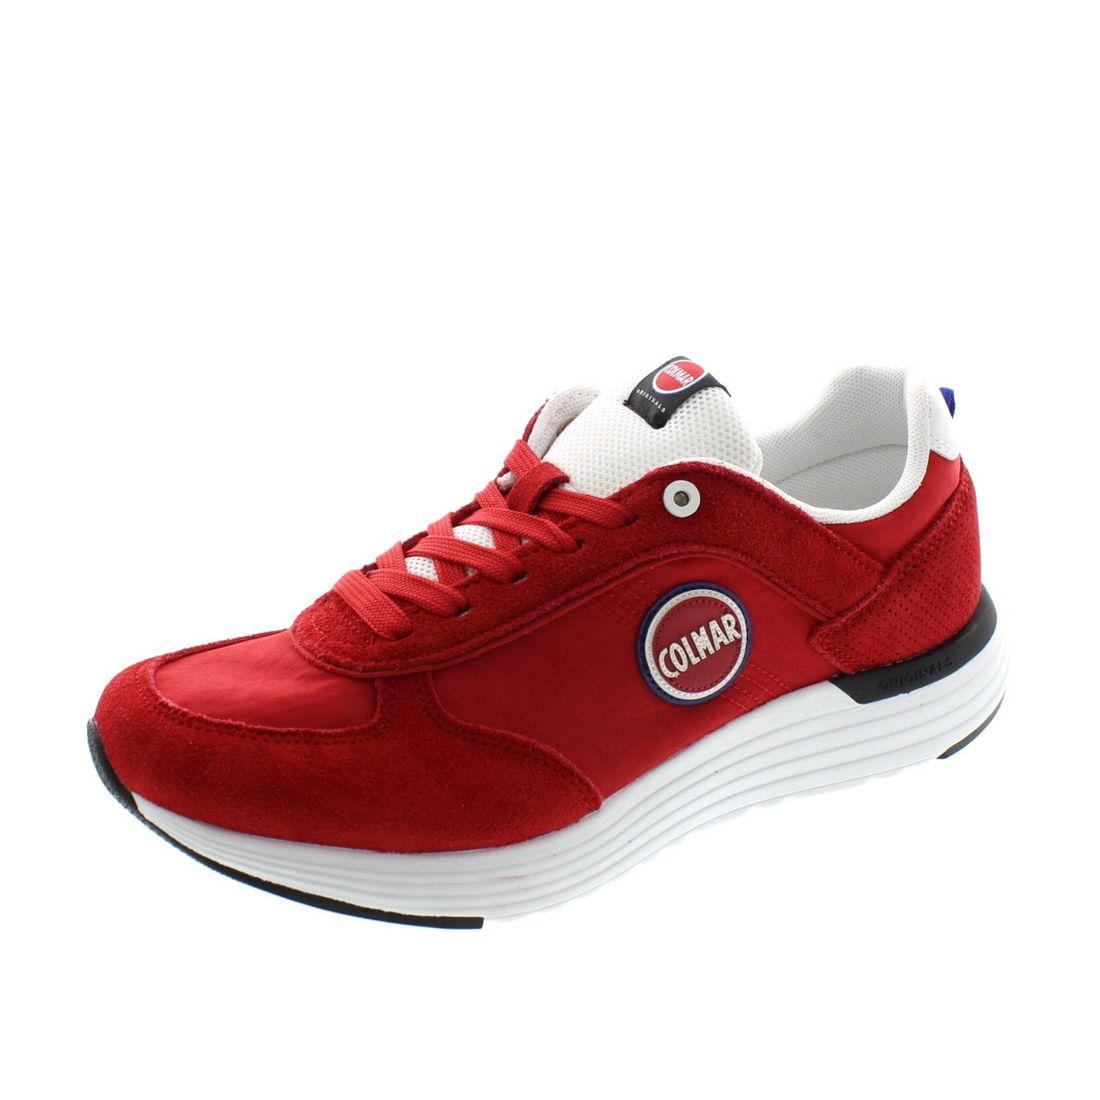 COLMAR Herrenschuhe - Sneaker Travis X-1 Bold 008 - red